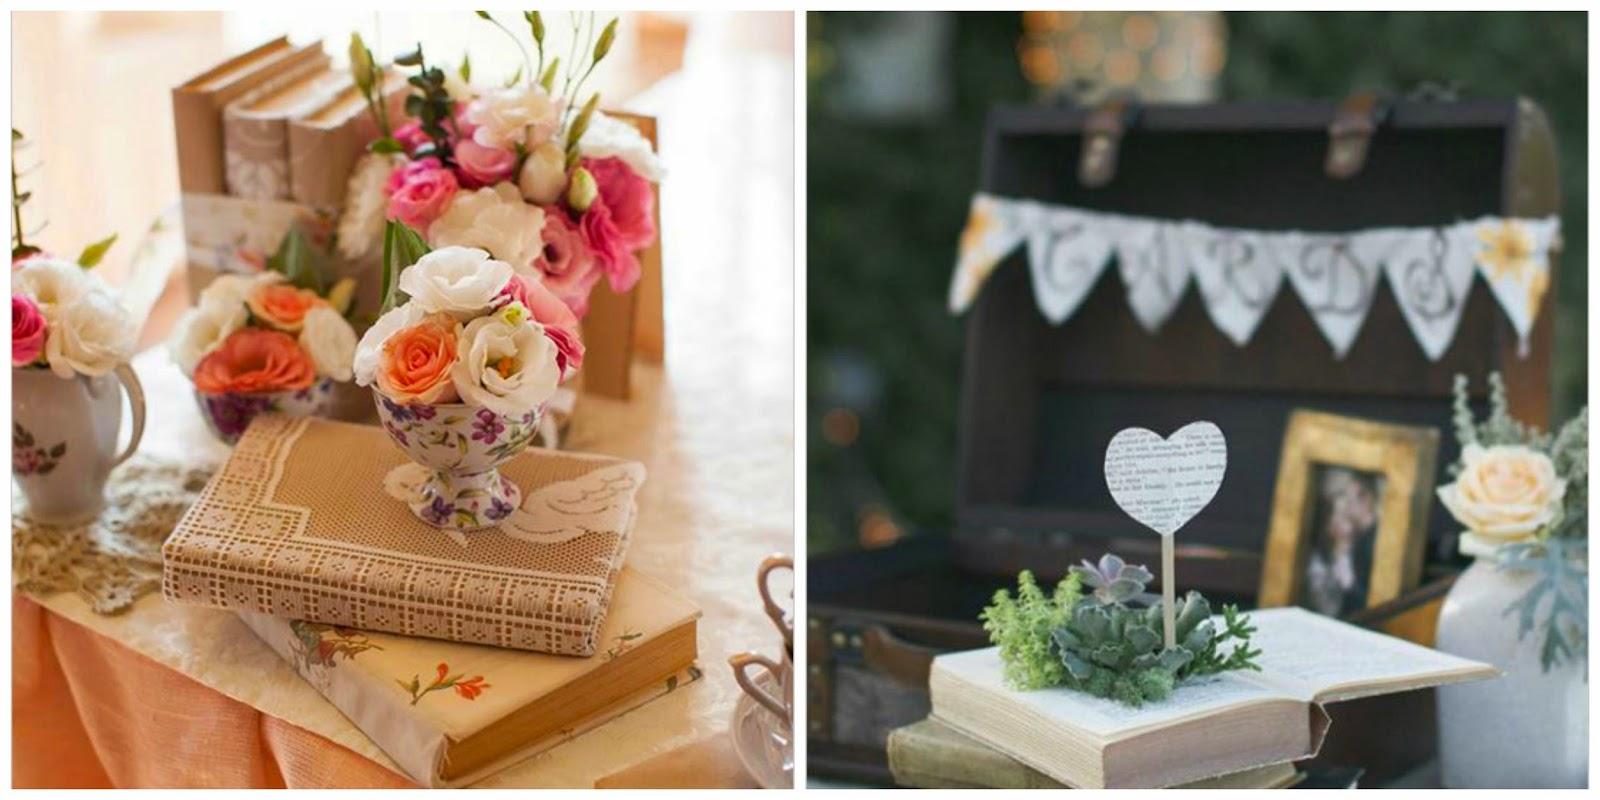 Abril 2014 blog de bodas para novias - Libros para decorar ...